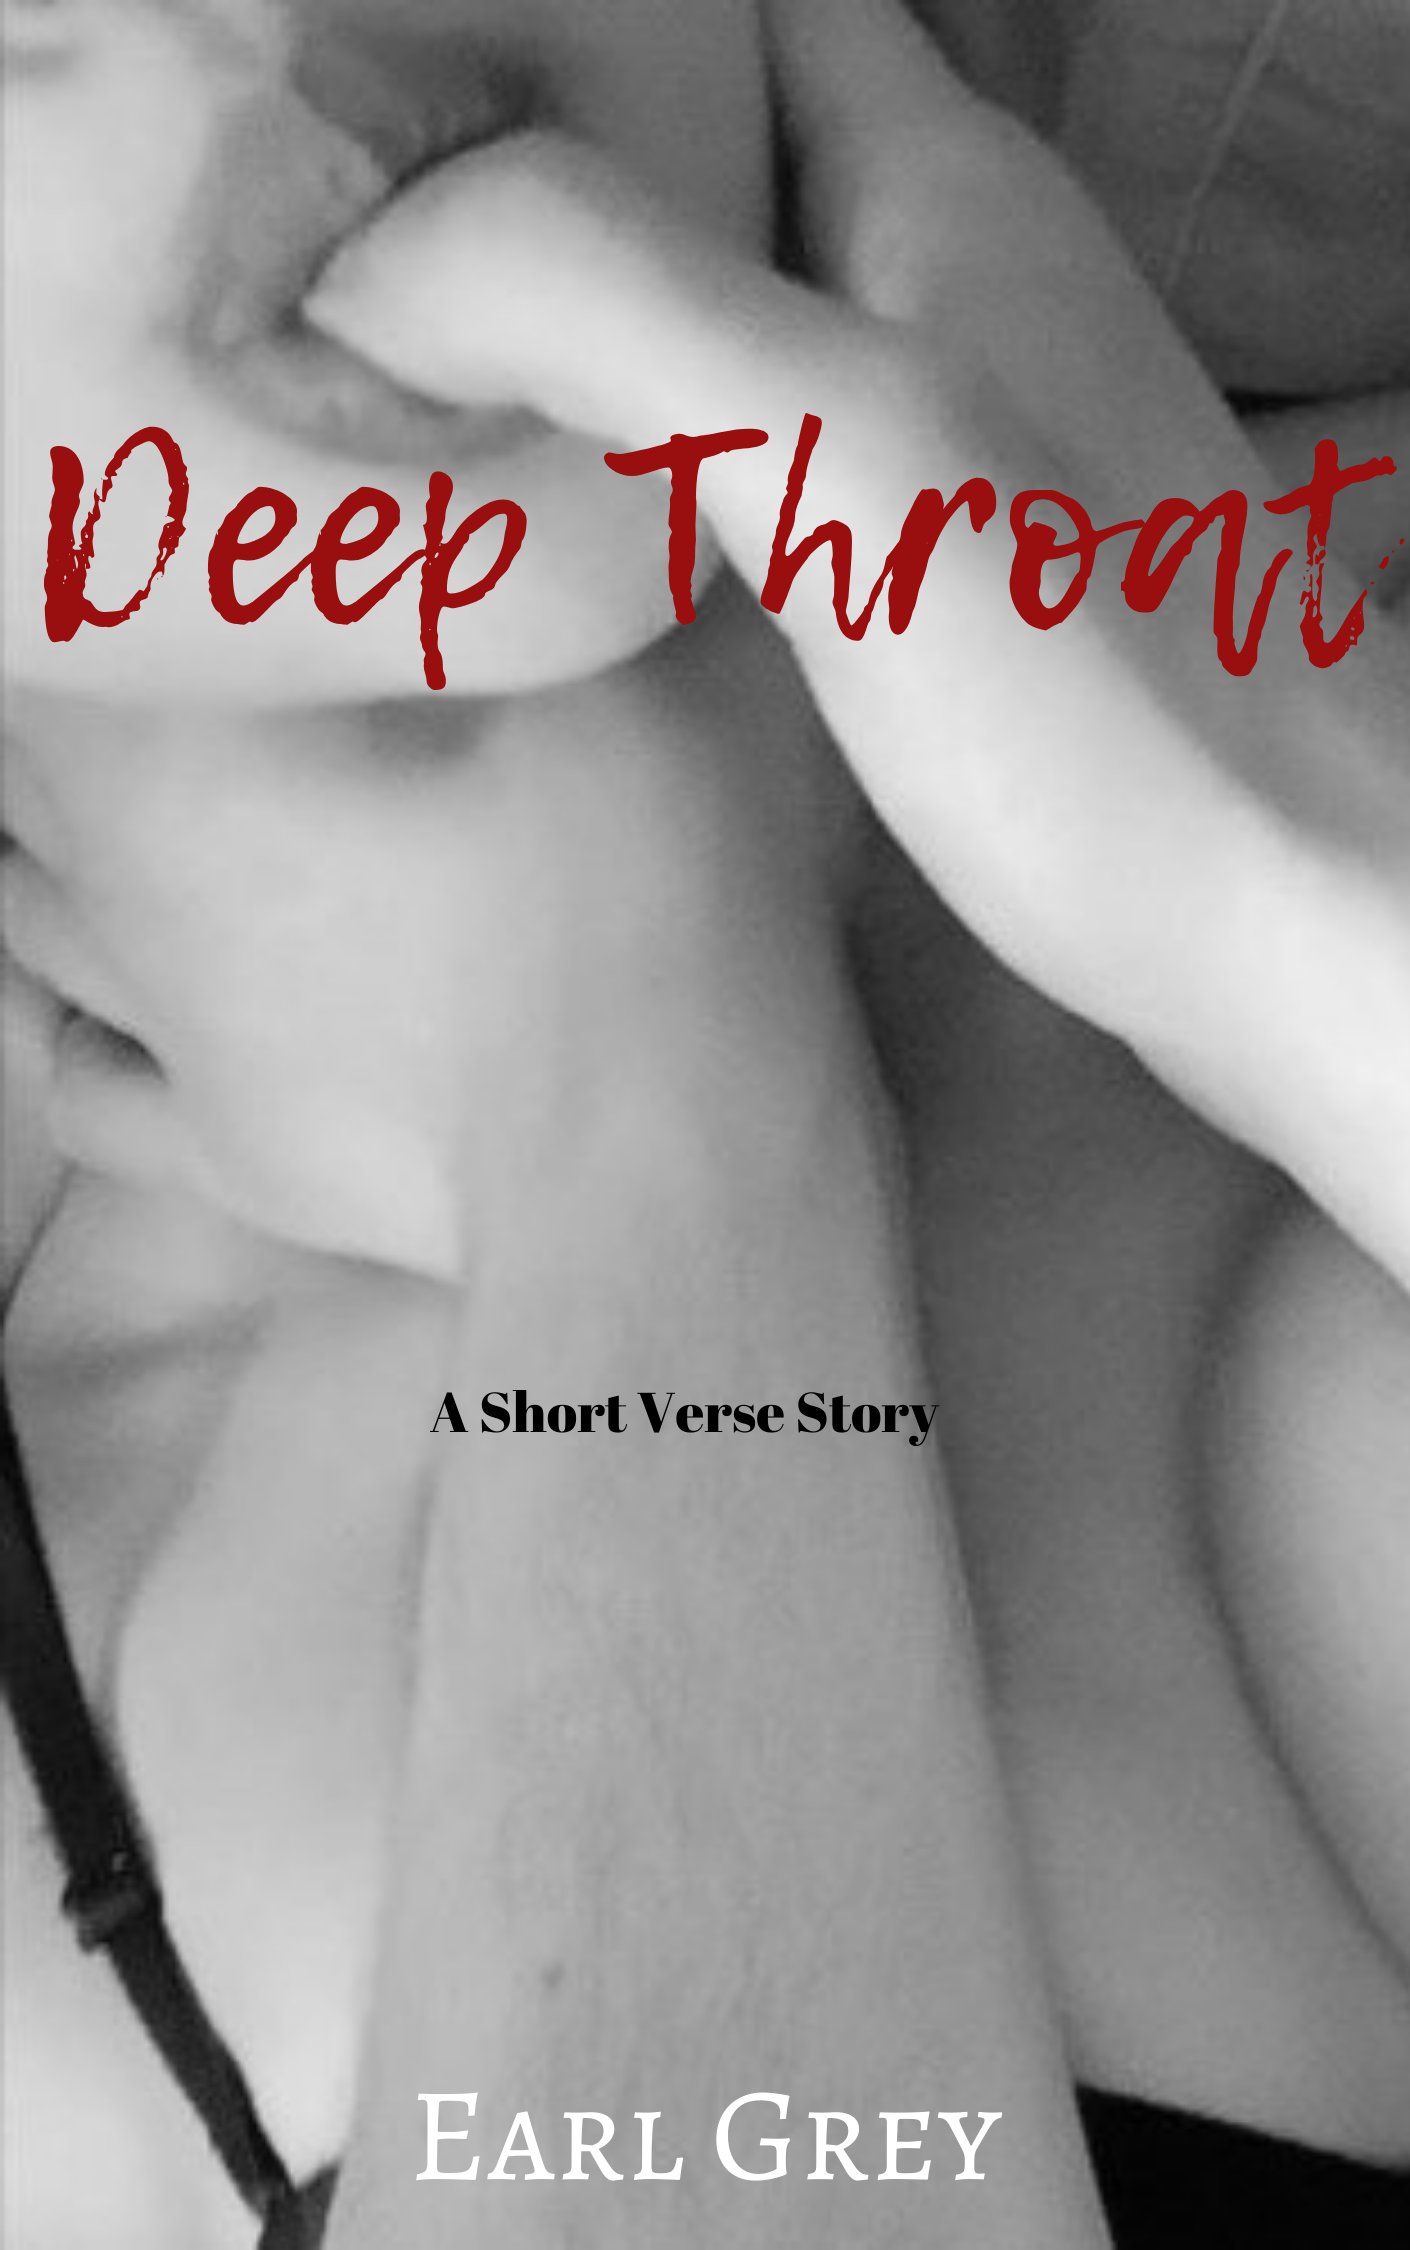 How to deep throat a man